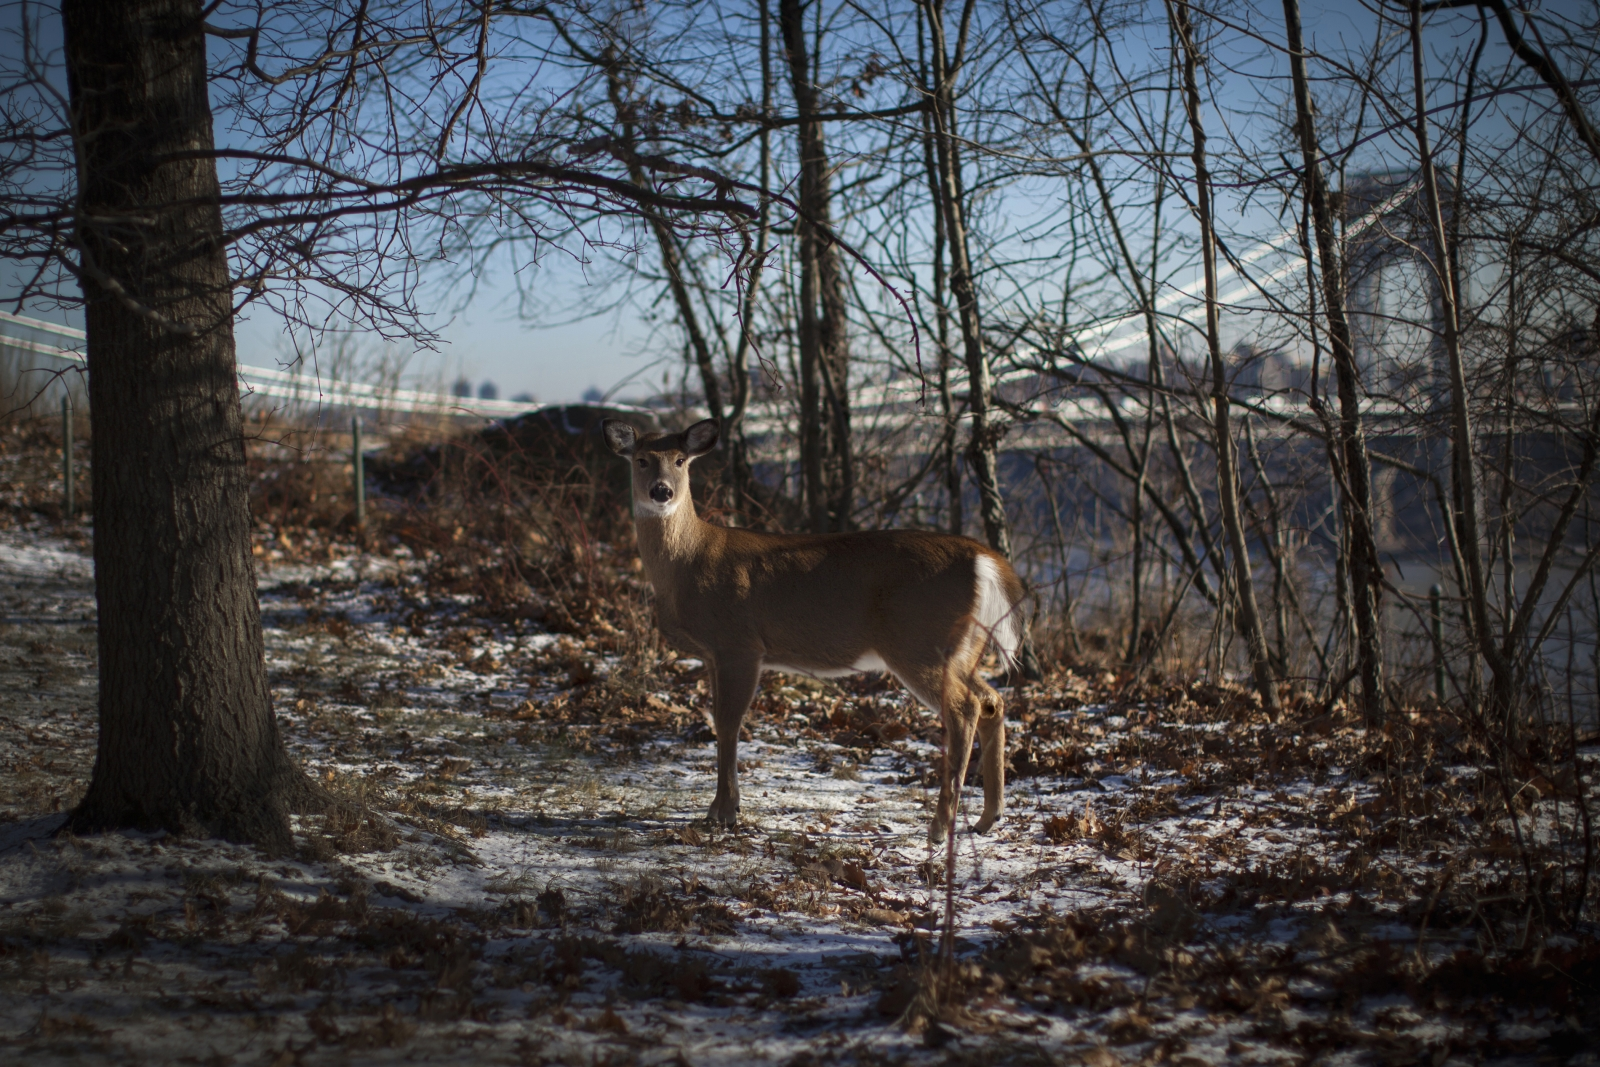 Deer enters walmart